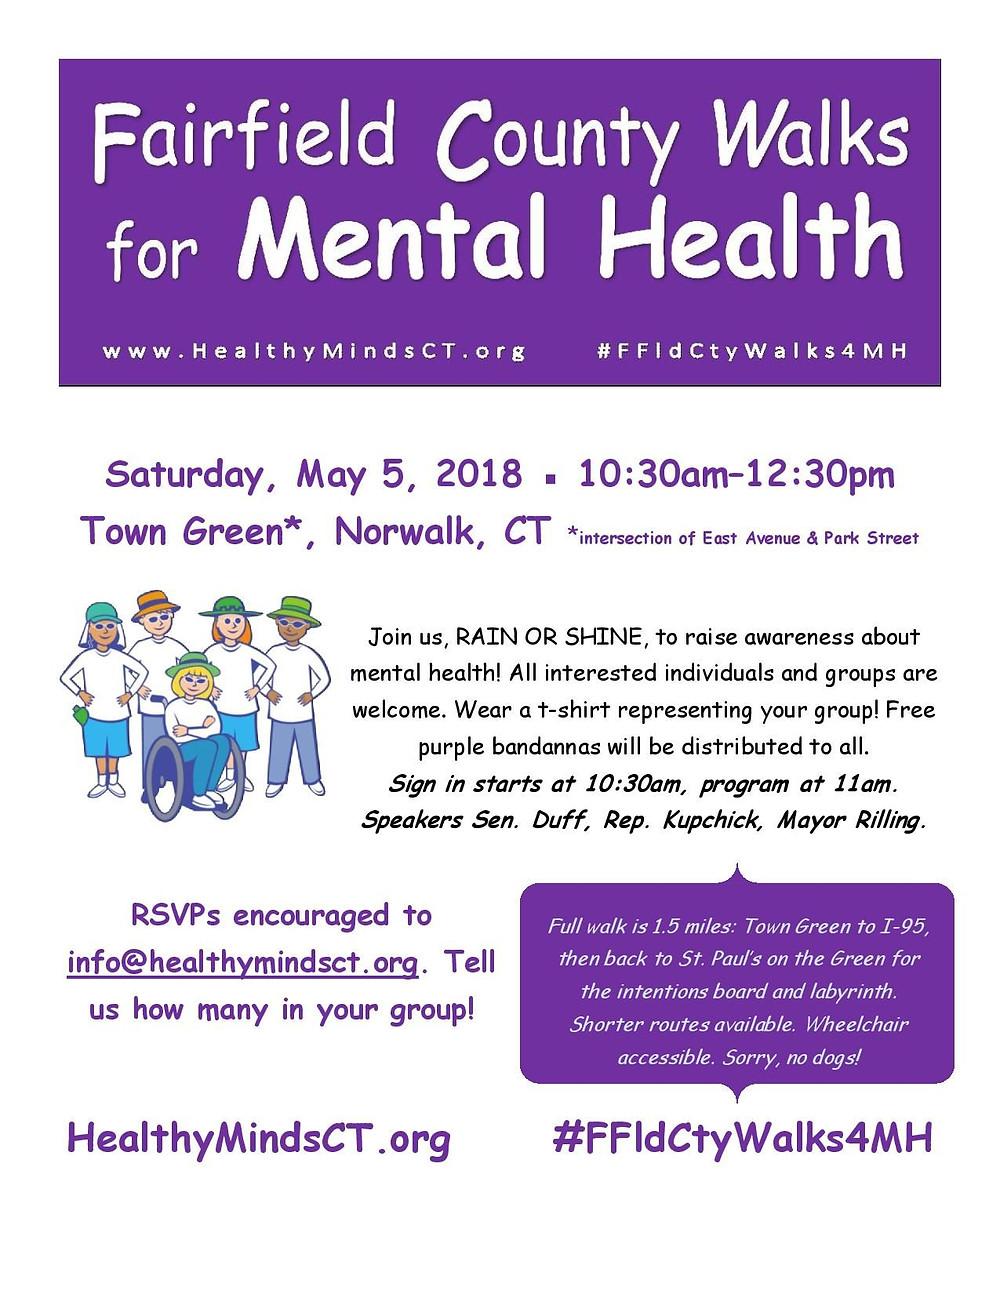 flyer for mental health awareness walk